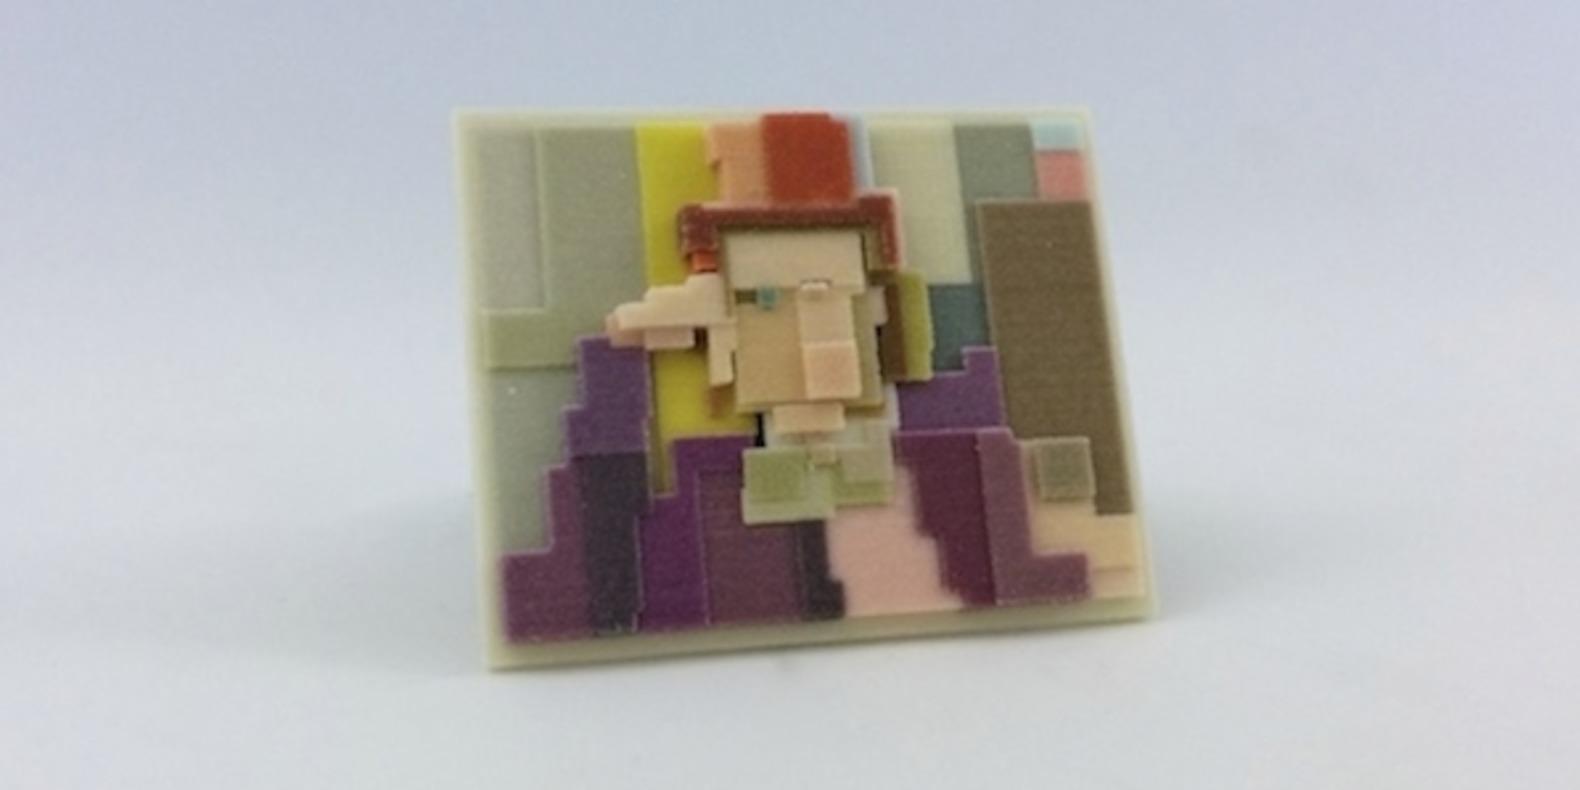 adam lister isaac budmen 8 Bits, 3 Dimensions art 3D printing printed cults3D fichier 3D designer artist ETR breaking bad superman mona lisa4